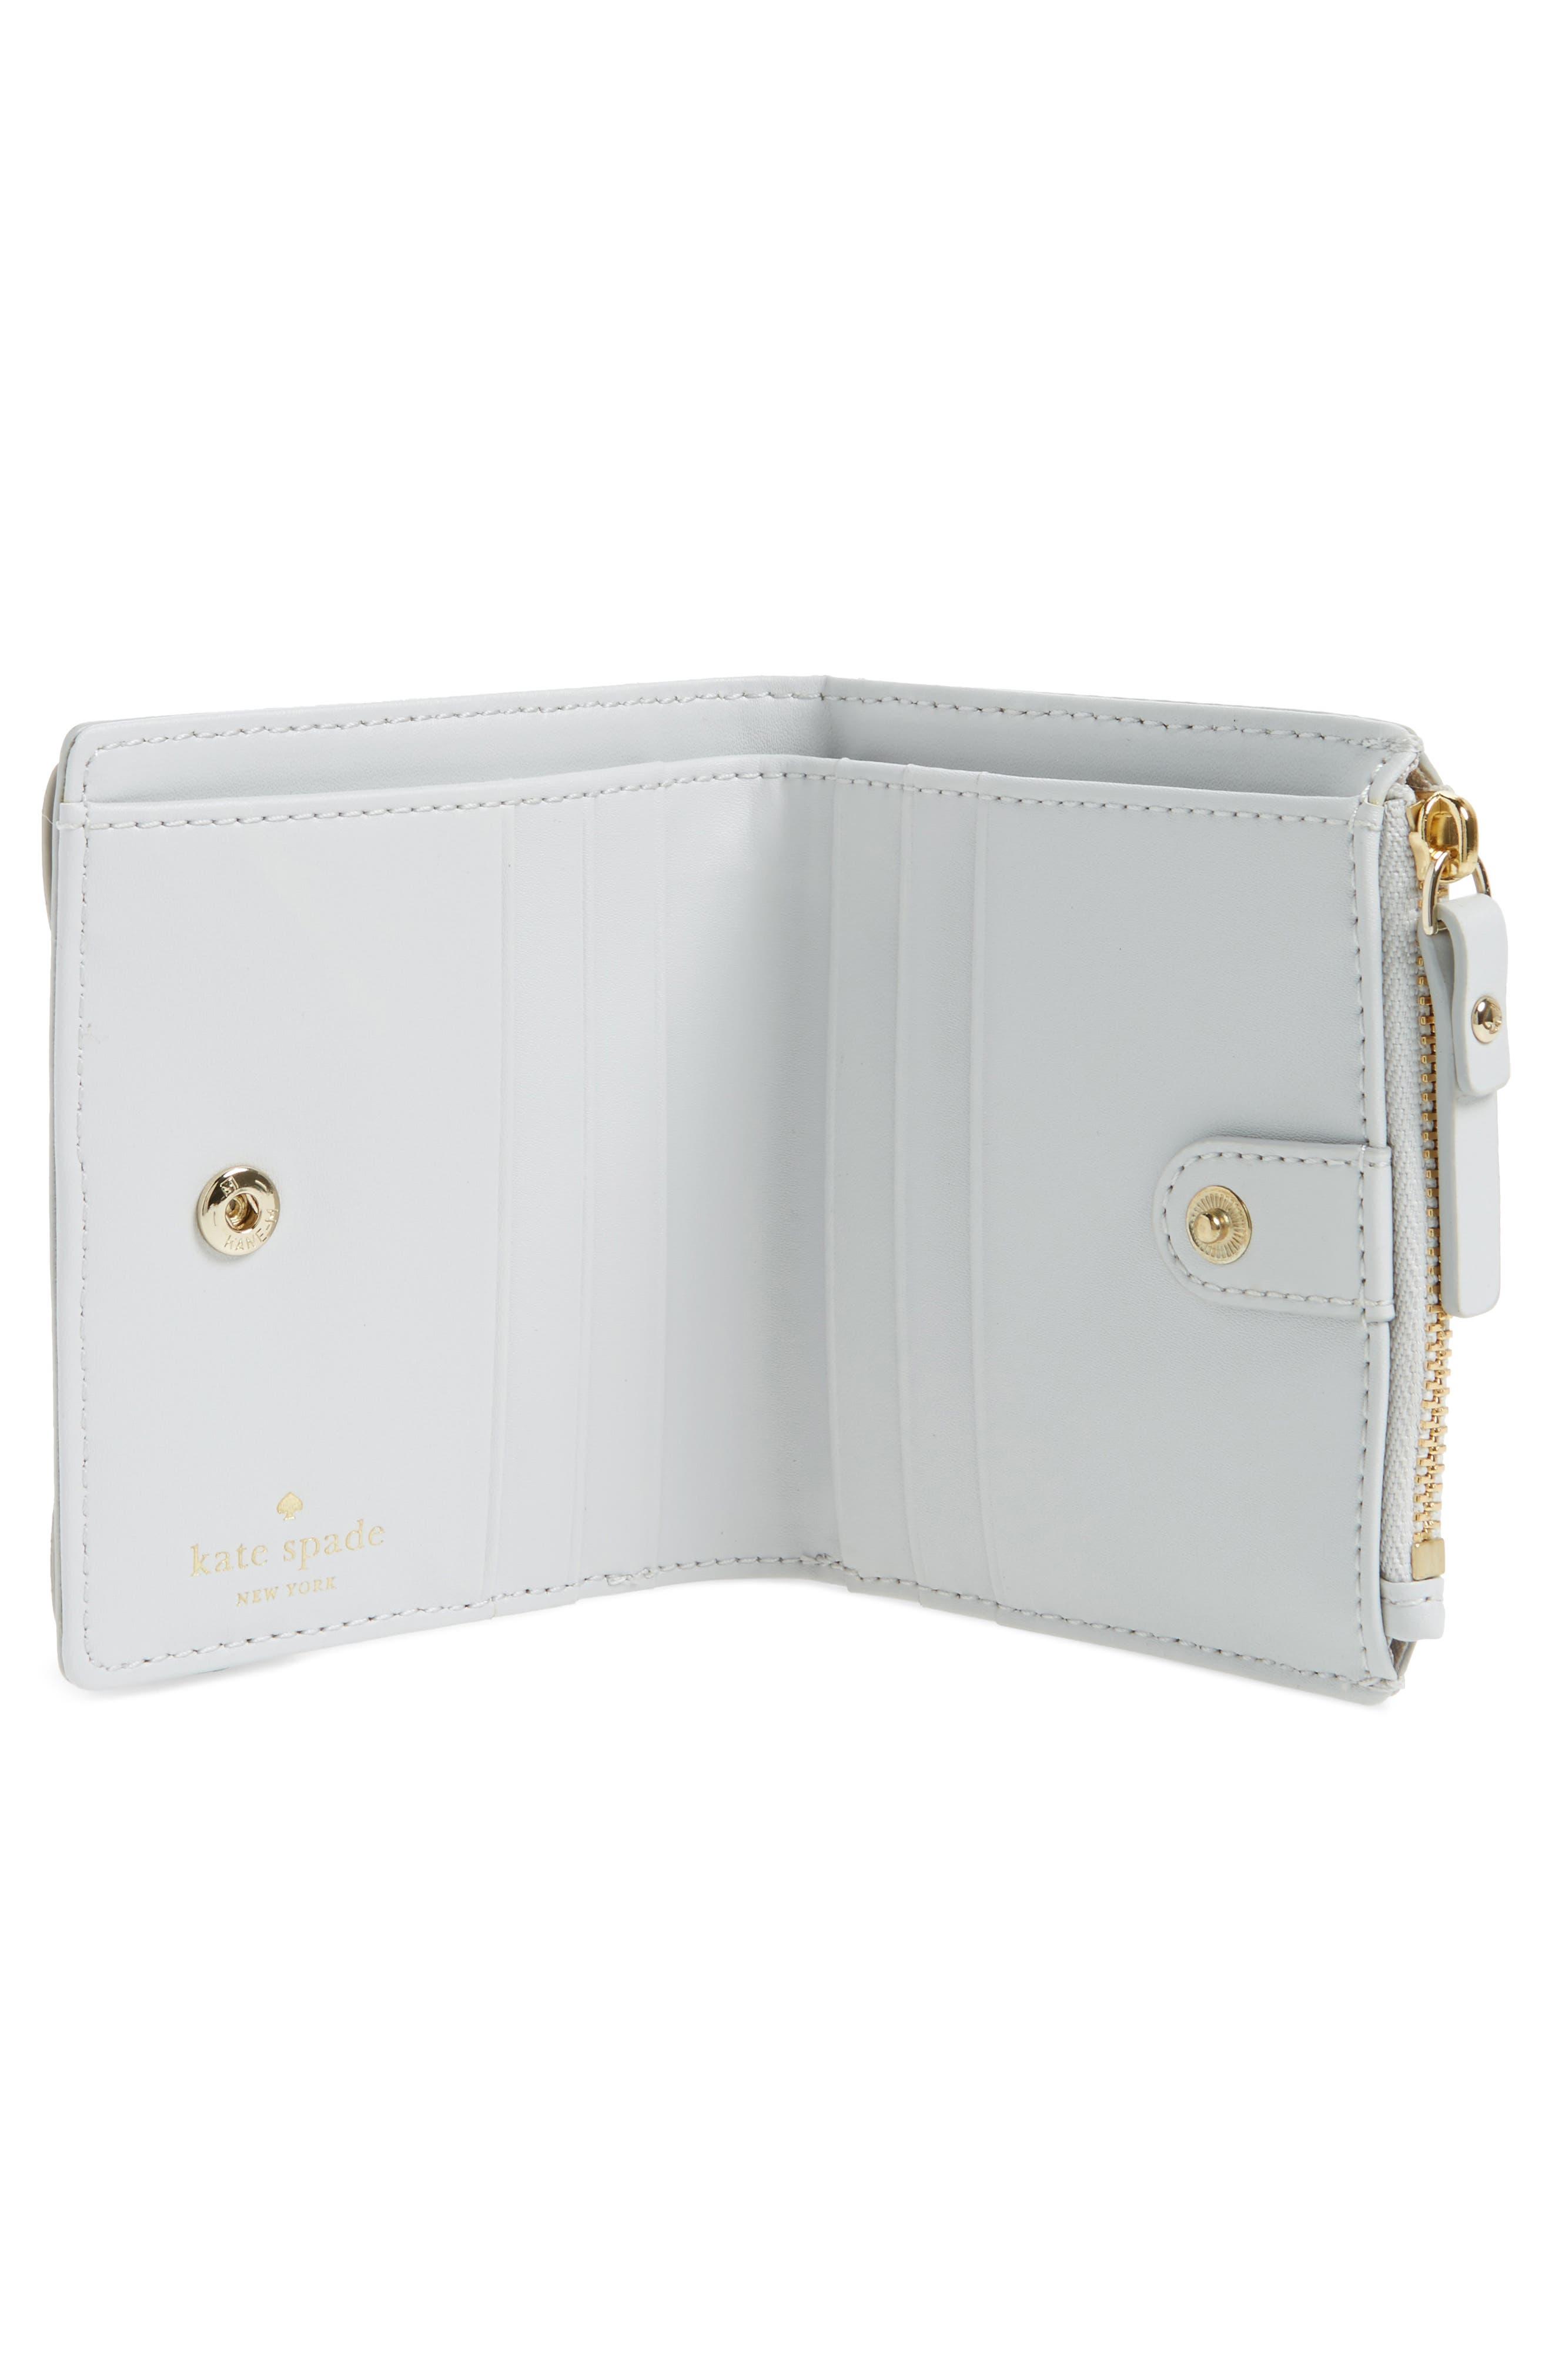 starbright owl adalyn leather card wallet,                             Alternate thumbnail 2, color,                             100